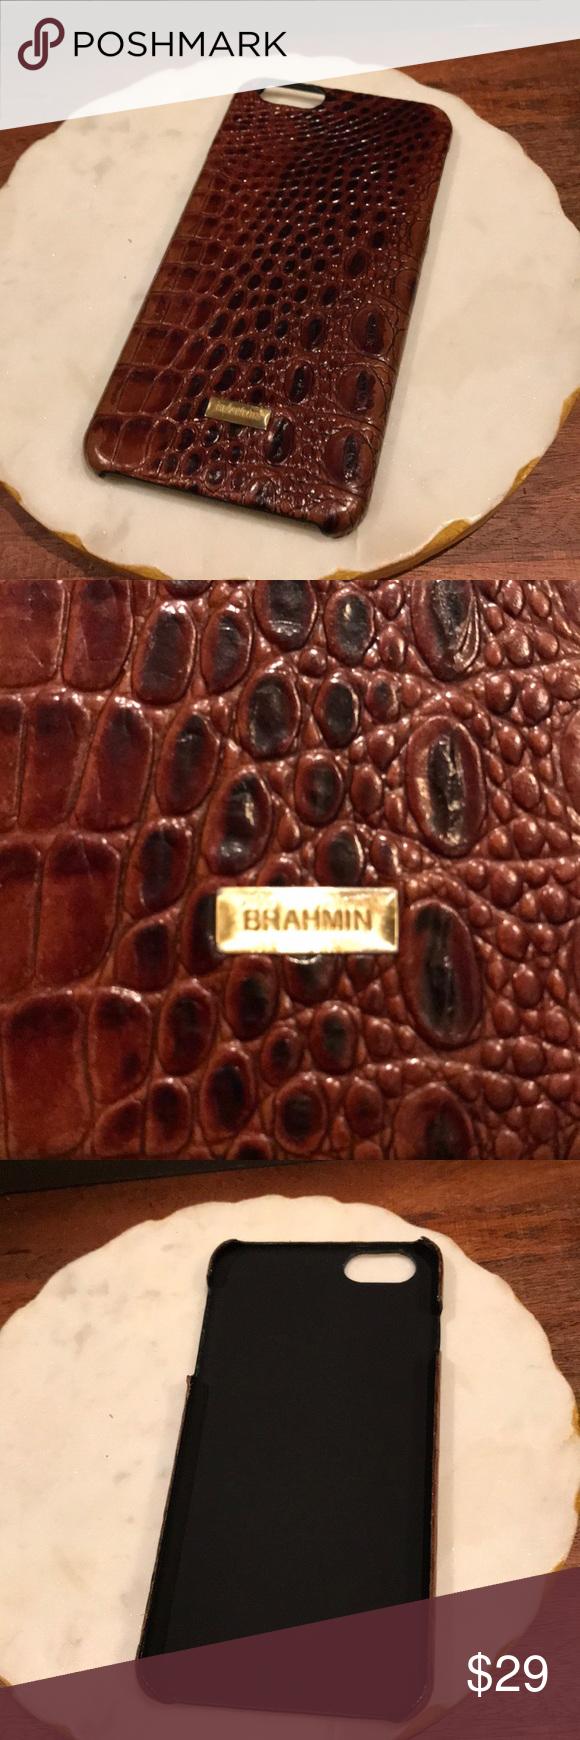 premium selection 037cc 104d9 Brahmin iPhone 7/8 plus case Never used. Gorgeous brown crocodile ...